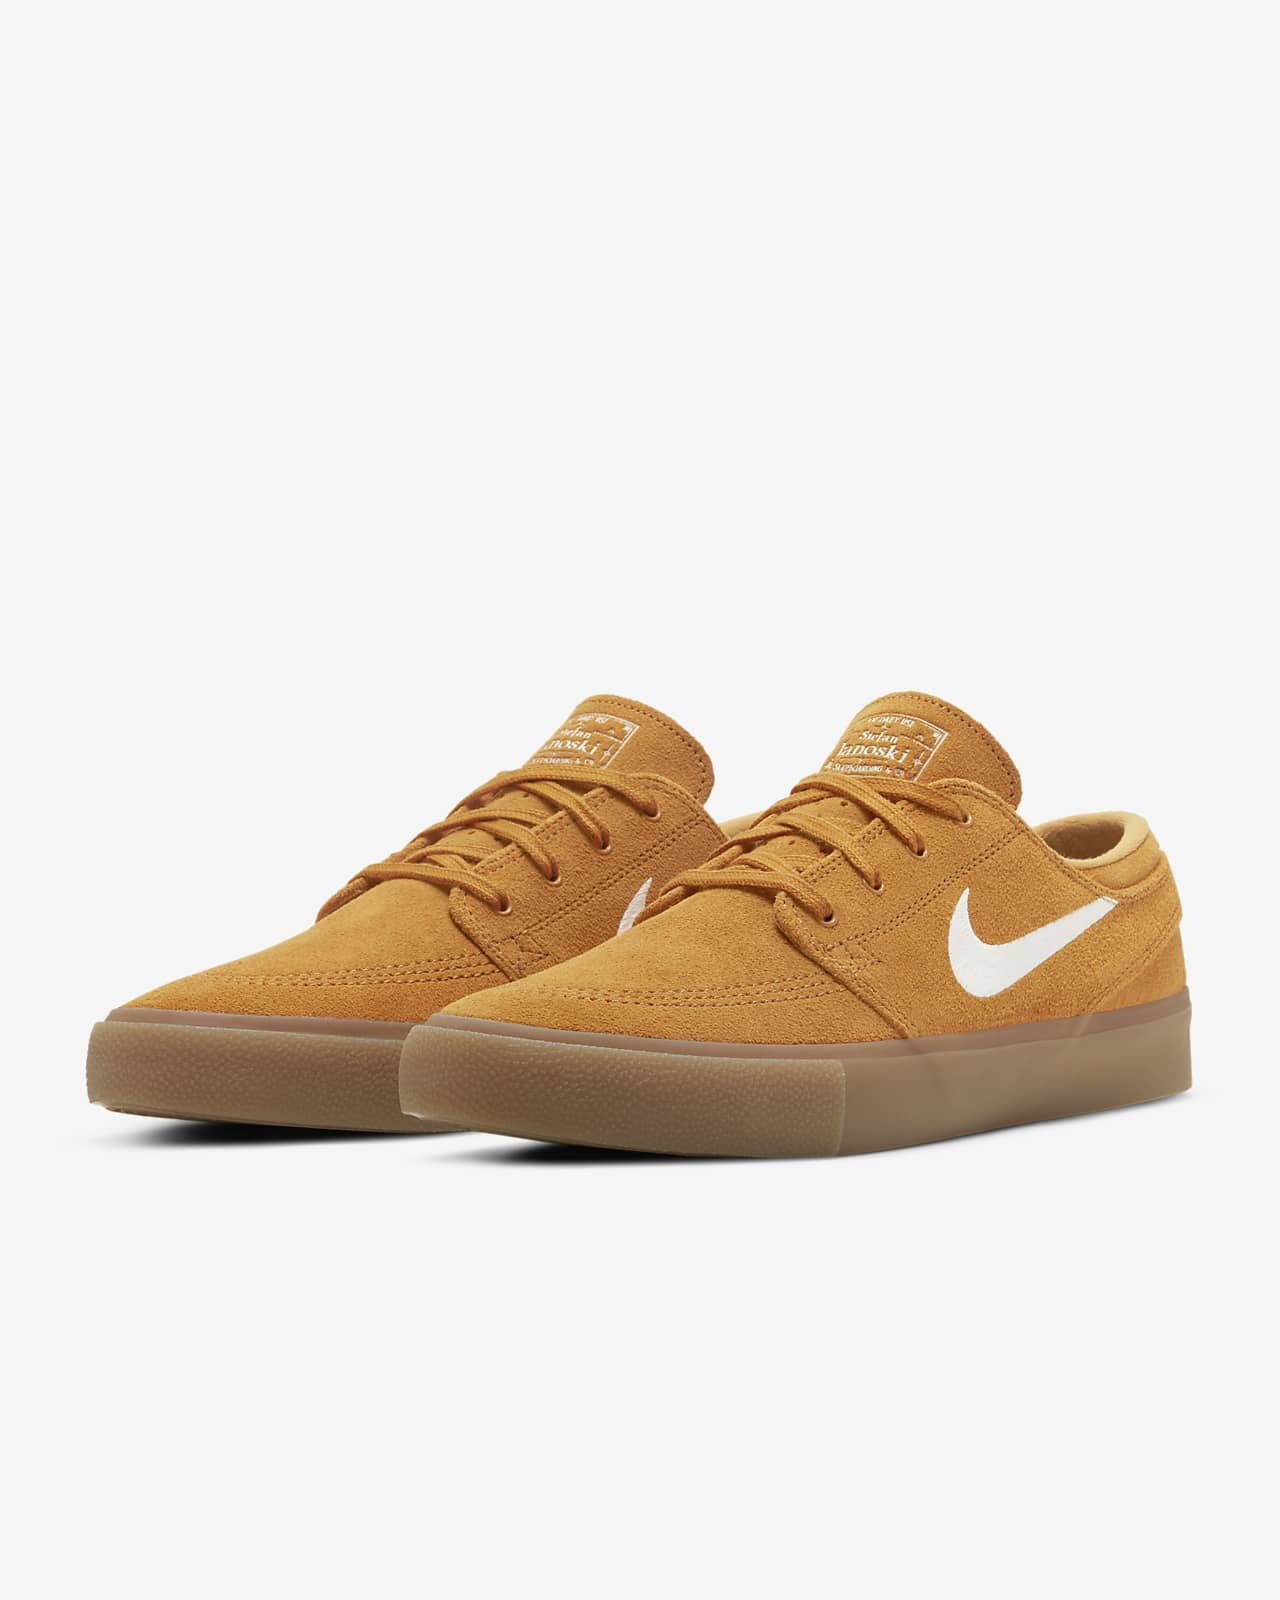 Mostrarte partido Democrático Pelearse  Nike SB Zoom Stefan Janoski RM Skate Shoe. Nike LU